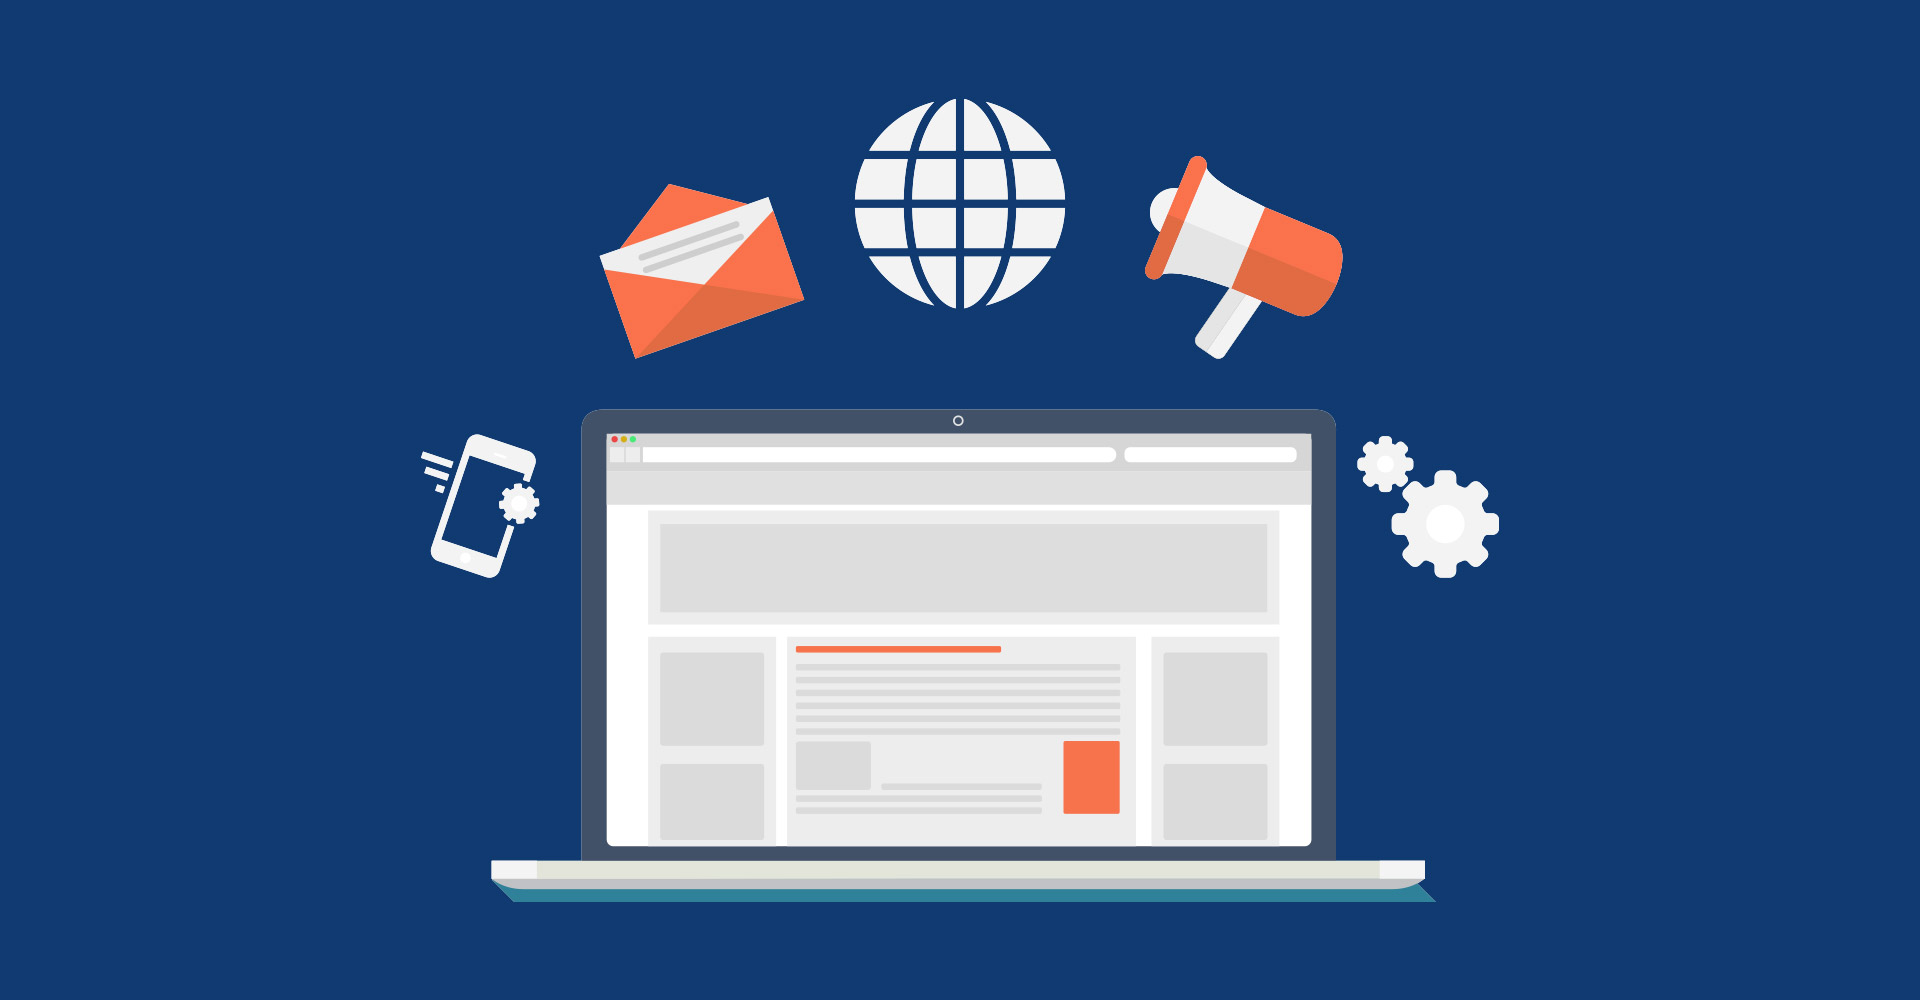 website updates maintenance - بازاریابی محتوا و جایگاه آن در کسب و کار امروز